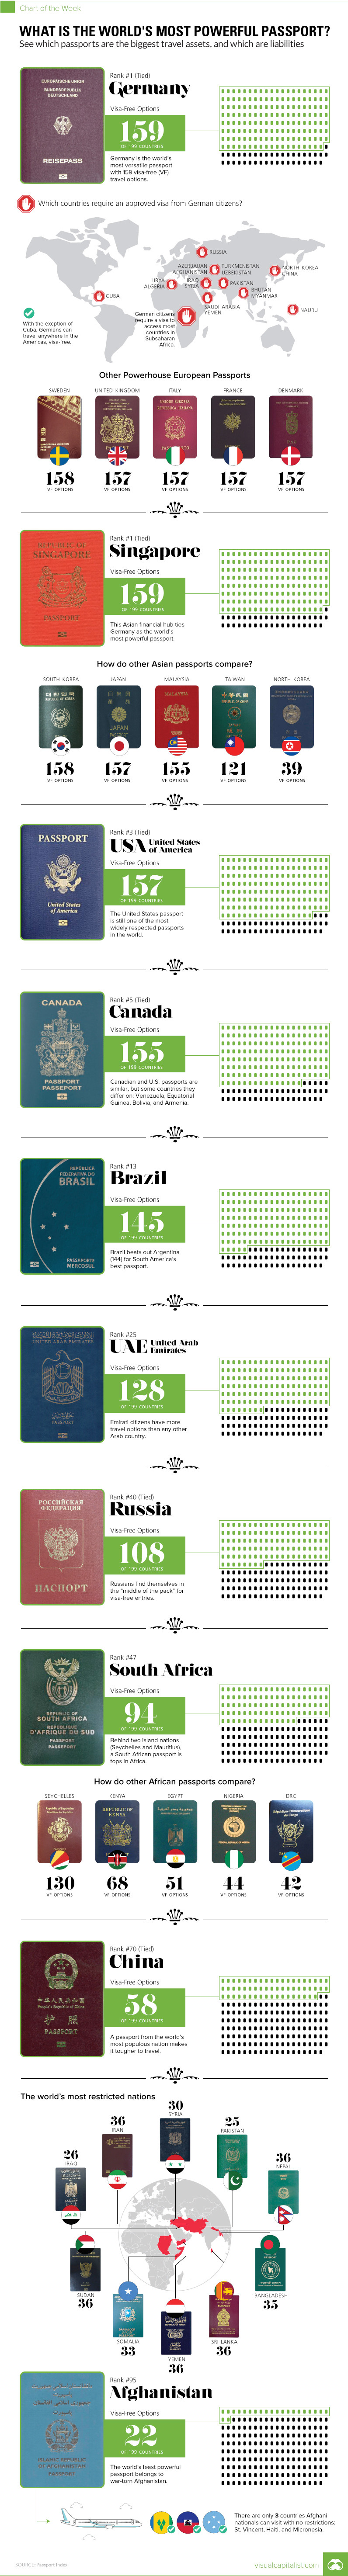 The World Most Powerful Passport